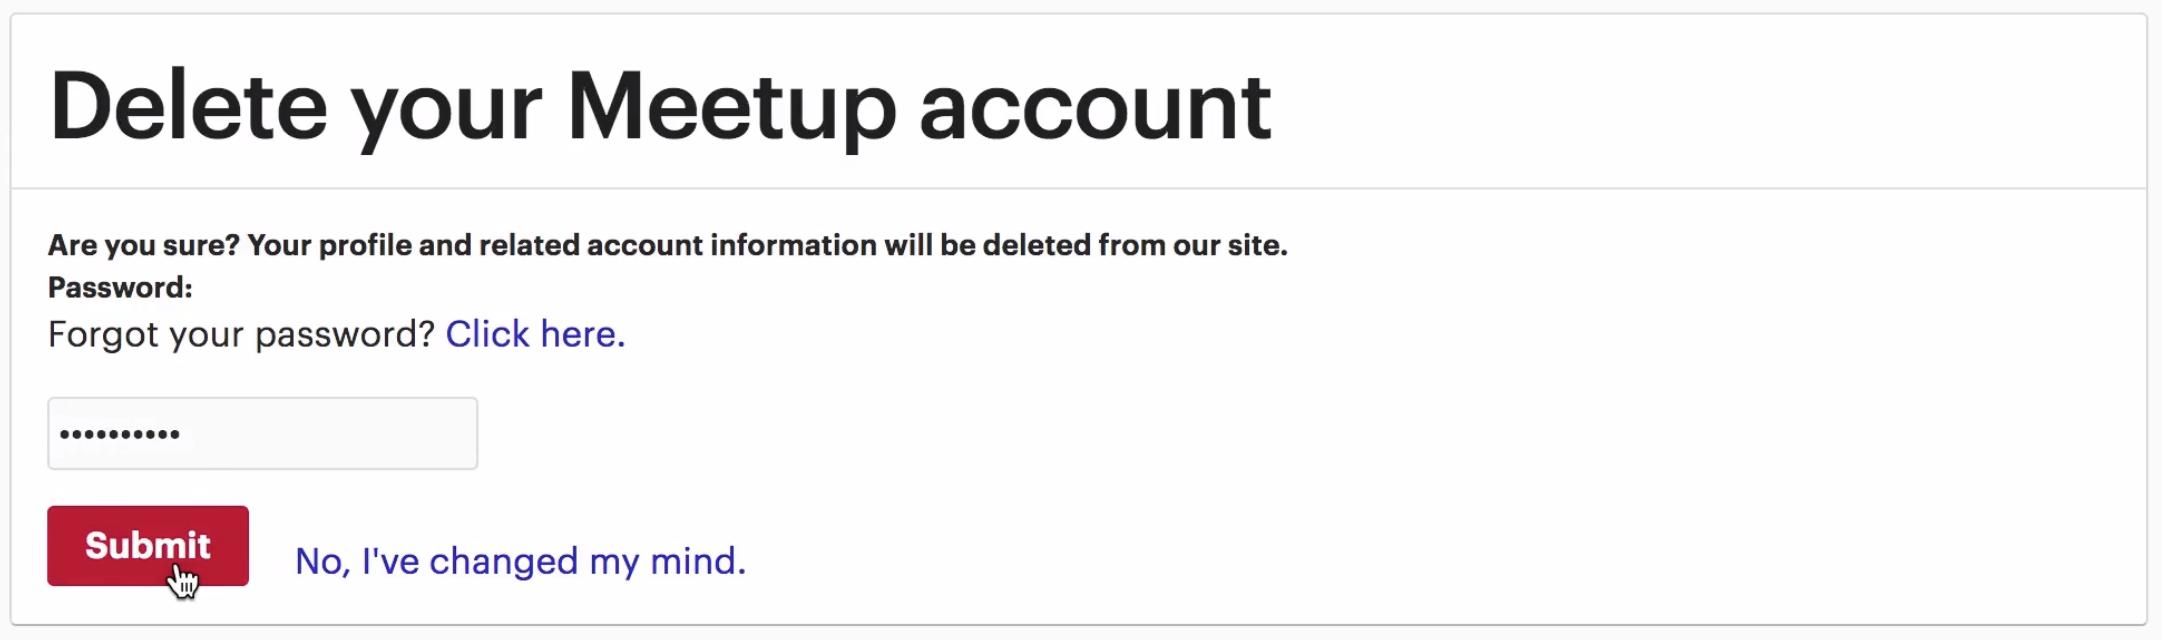 Meetup delete account screen